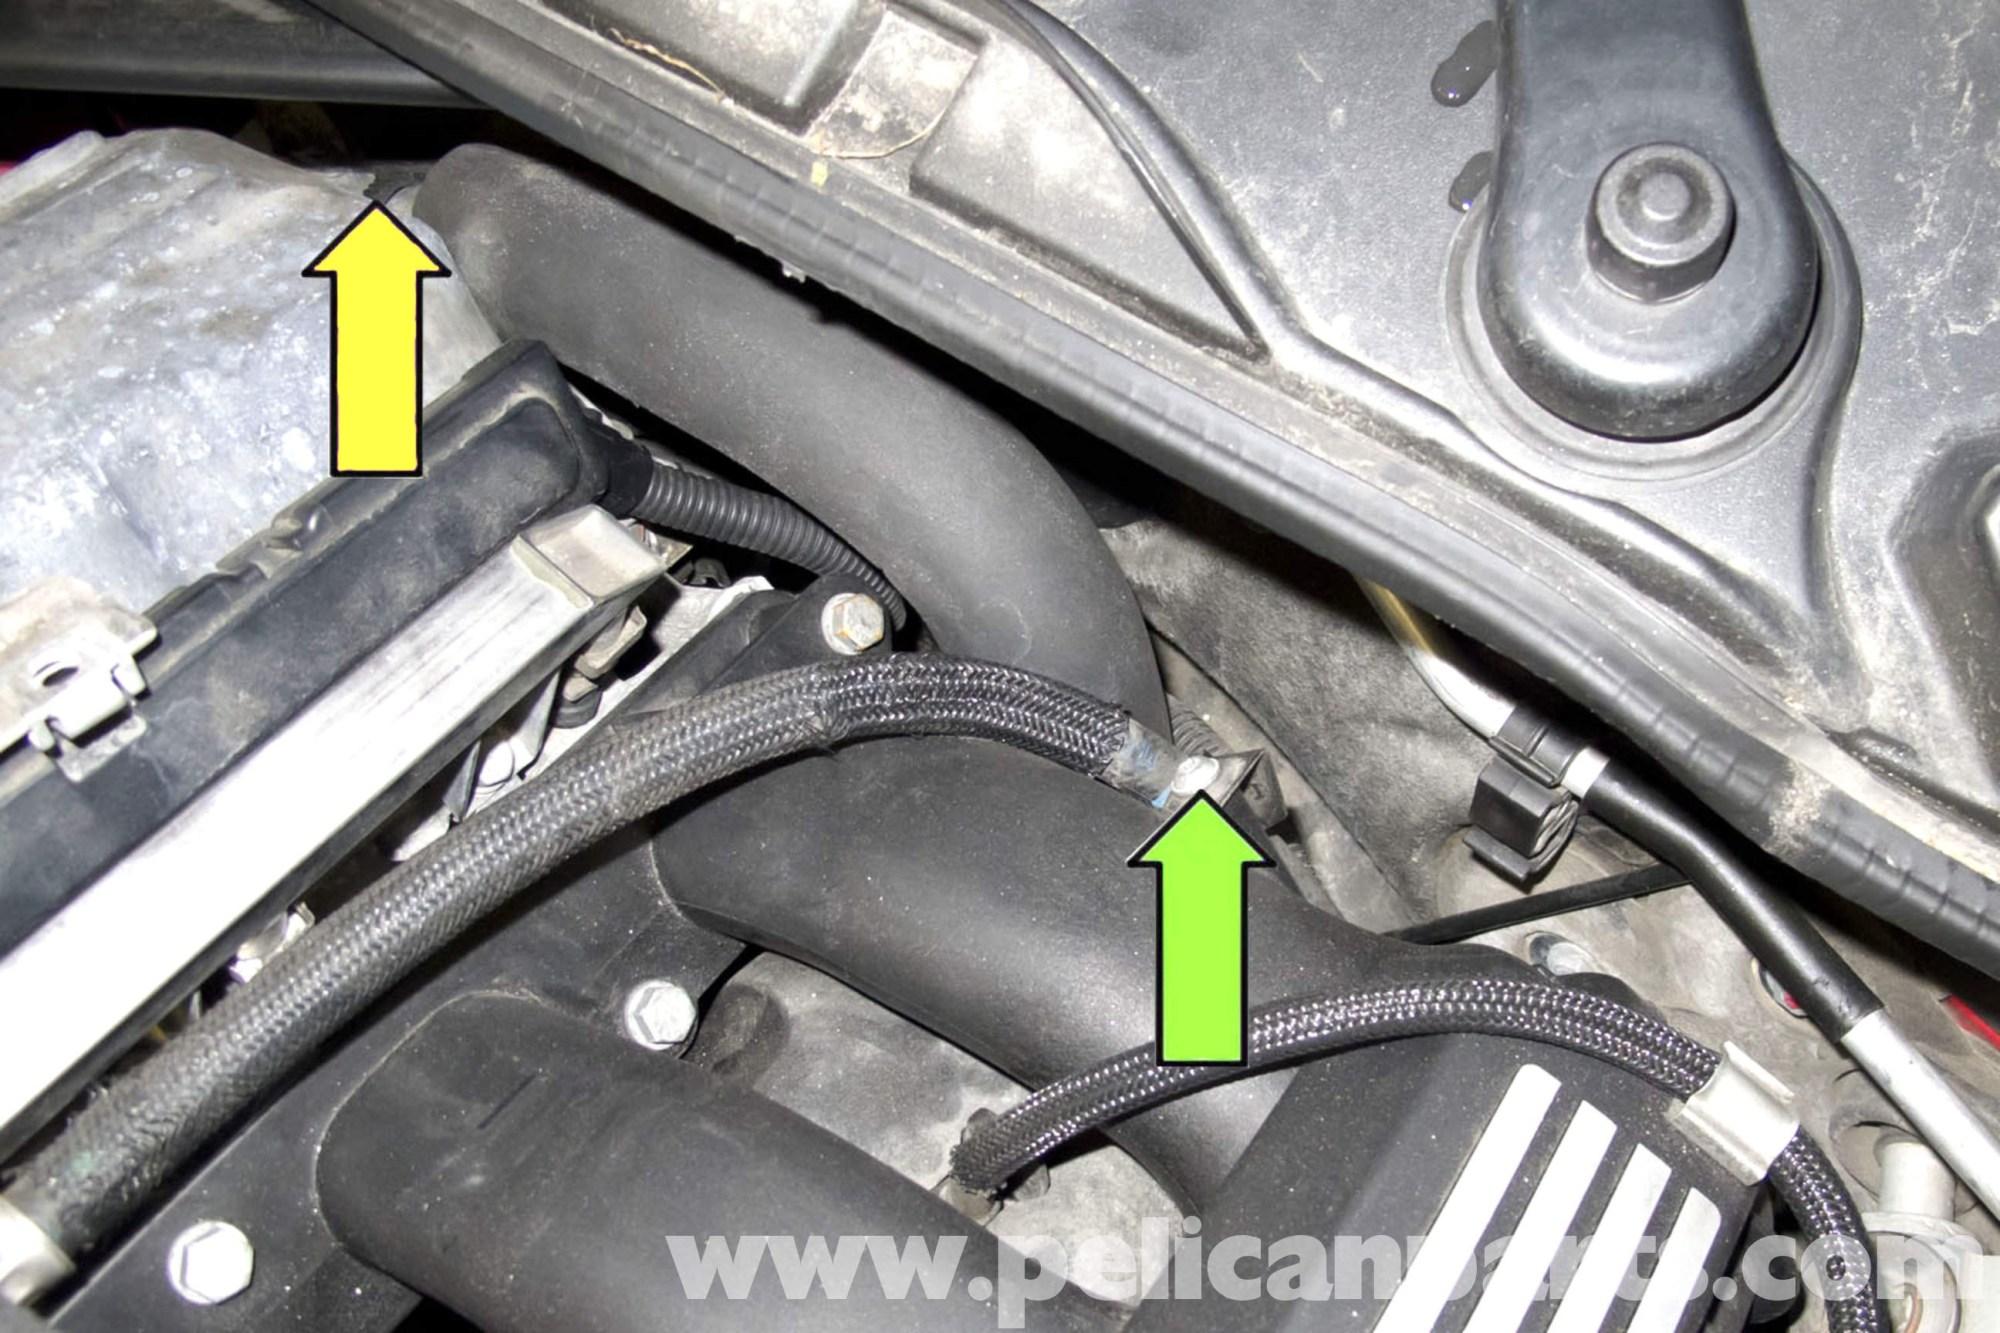 hight resolution of bmw 328i parts diagram bmw e90 intake manifold replacement e91 e92 e93 of bmw 328i parts